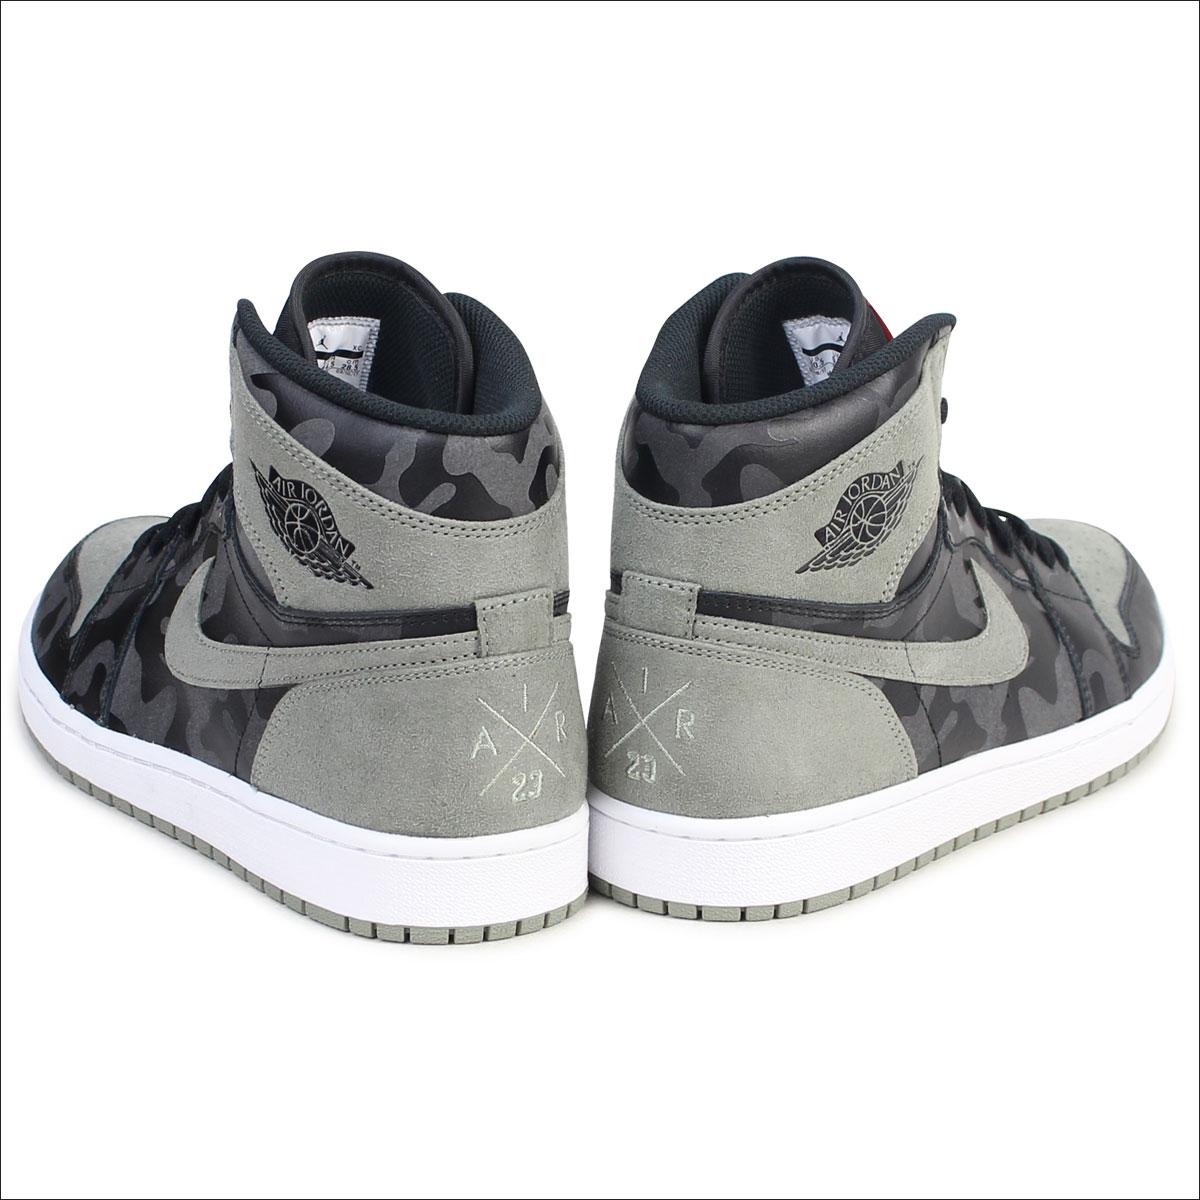 7104c799d7eaa [SOLD OUT] NIKE Nike Air Jordan 1 nostalgic high sneakers AIR JORDAN 1  RETRO HIGH PREMIUM AA3993-034 men shoes black